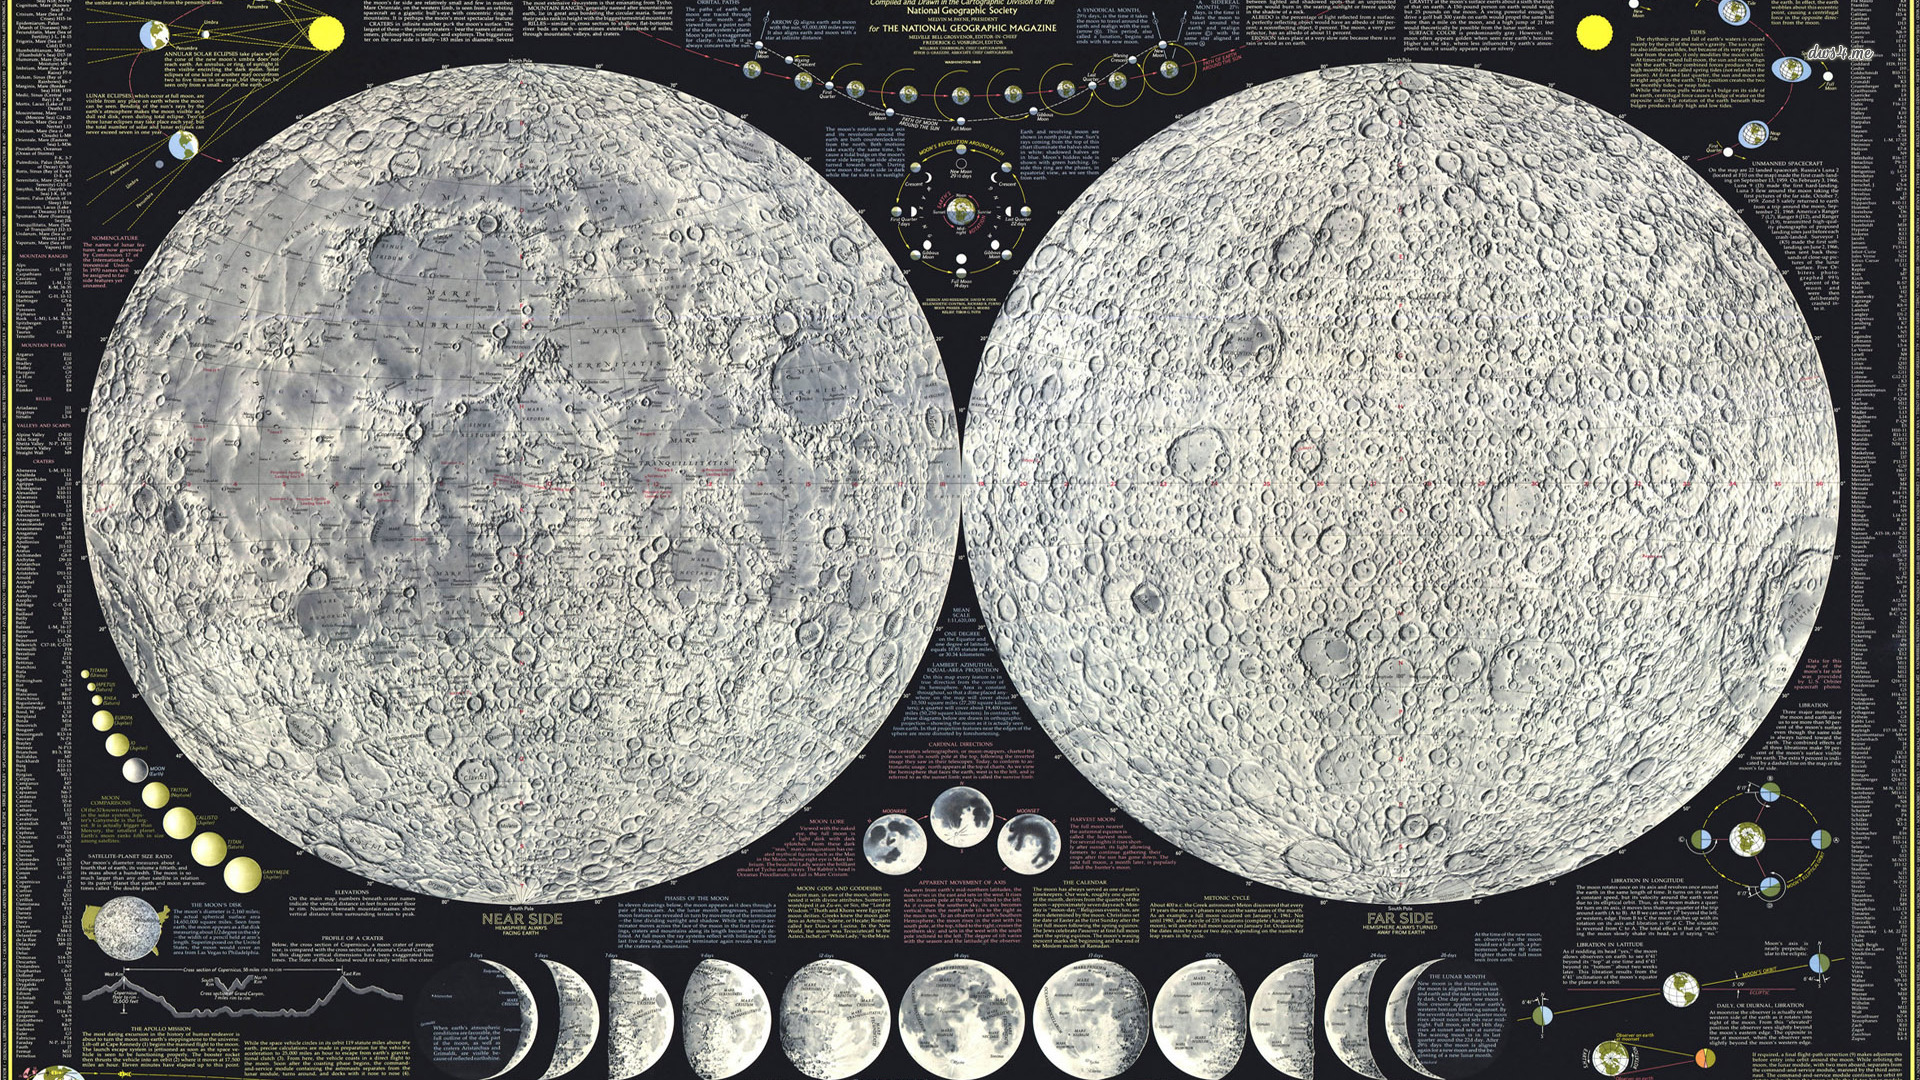 15827-moon-map-1920x1080-space-wallpaper.jpg